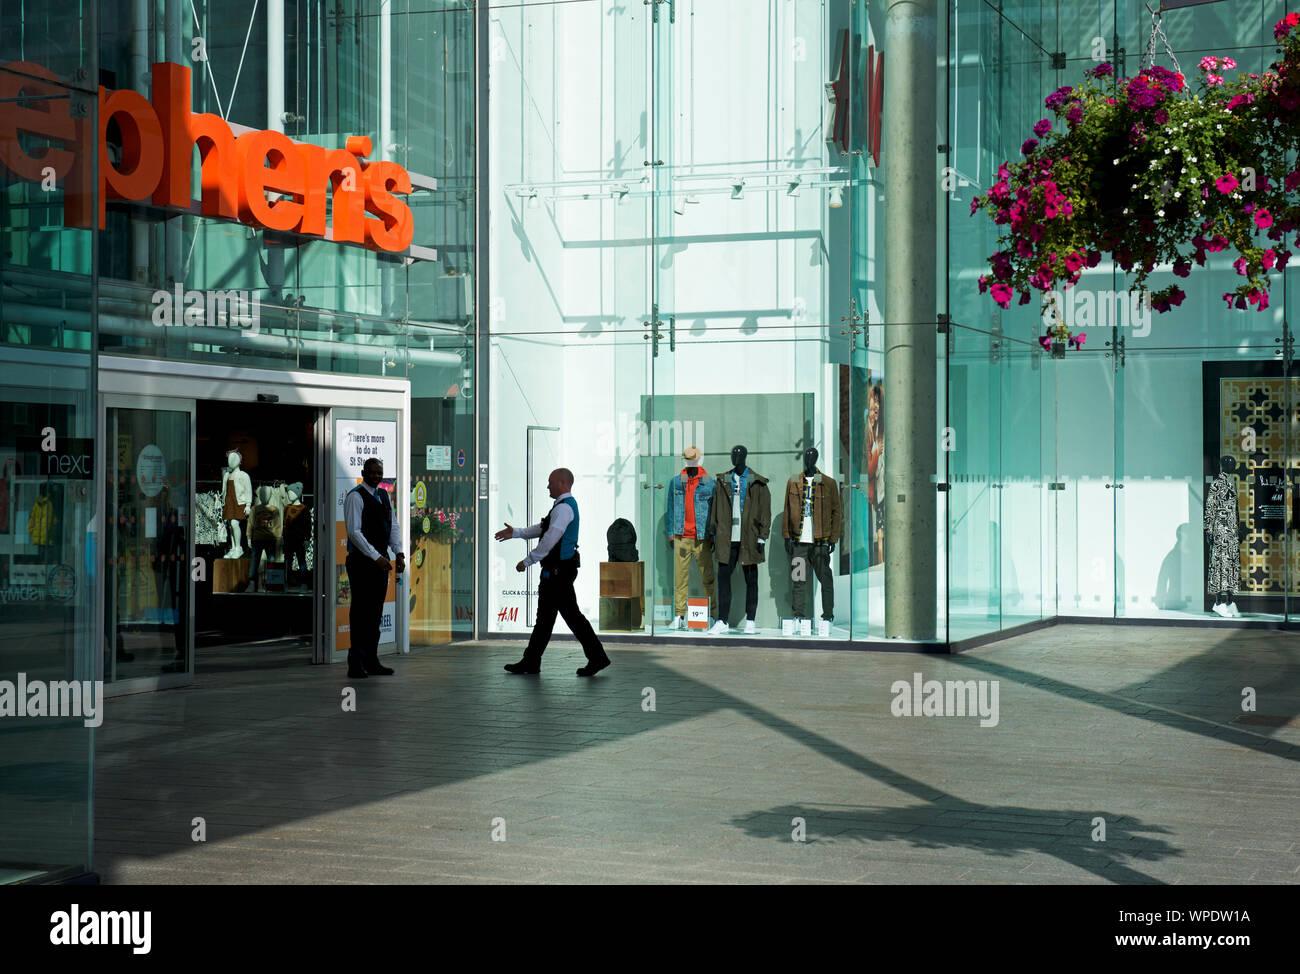 st-stephens-shopping-centre-hull-east-yorkshire-england-uk-WPDW1A.jpg